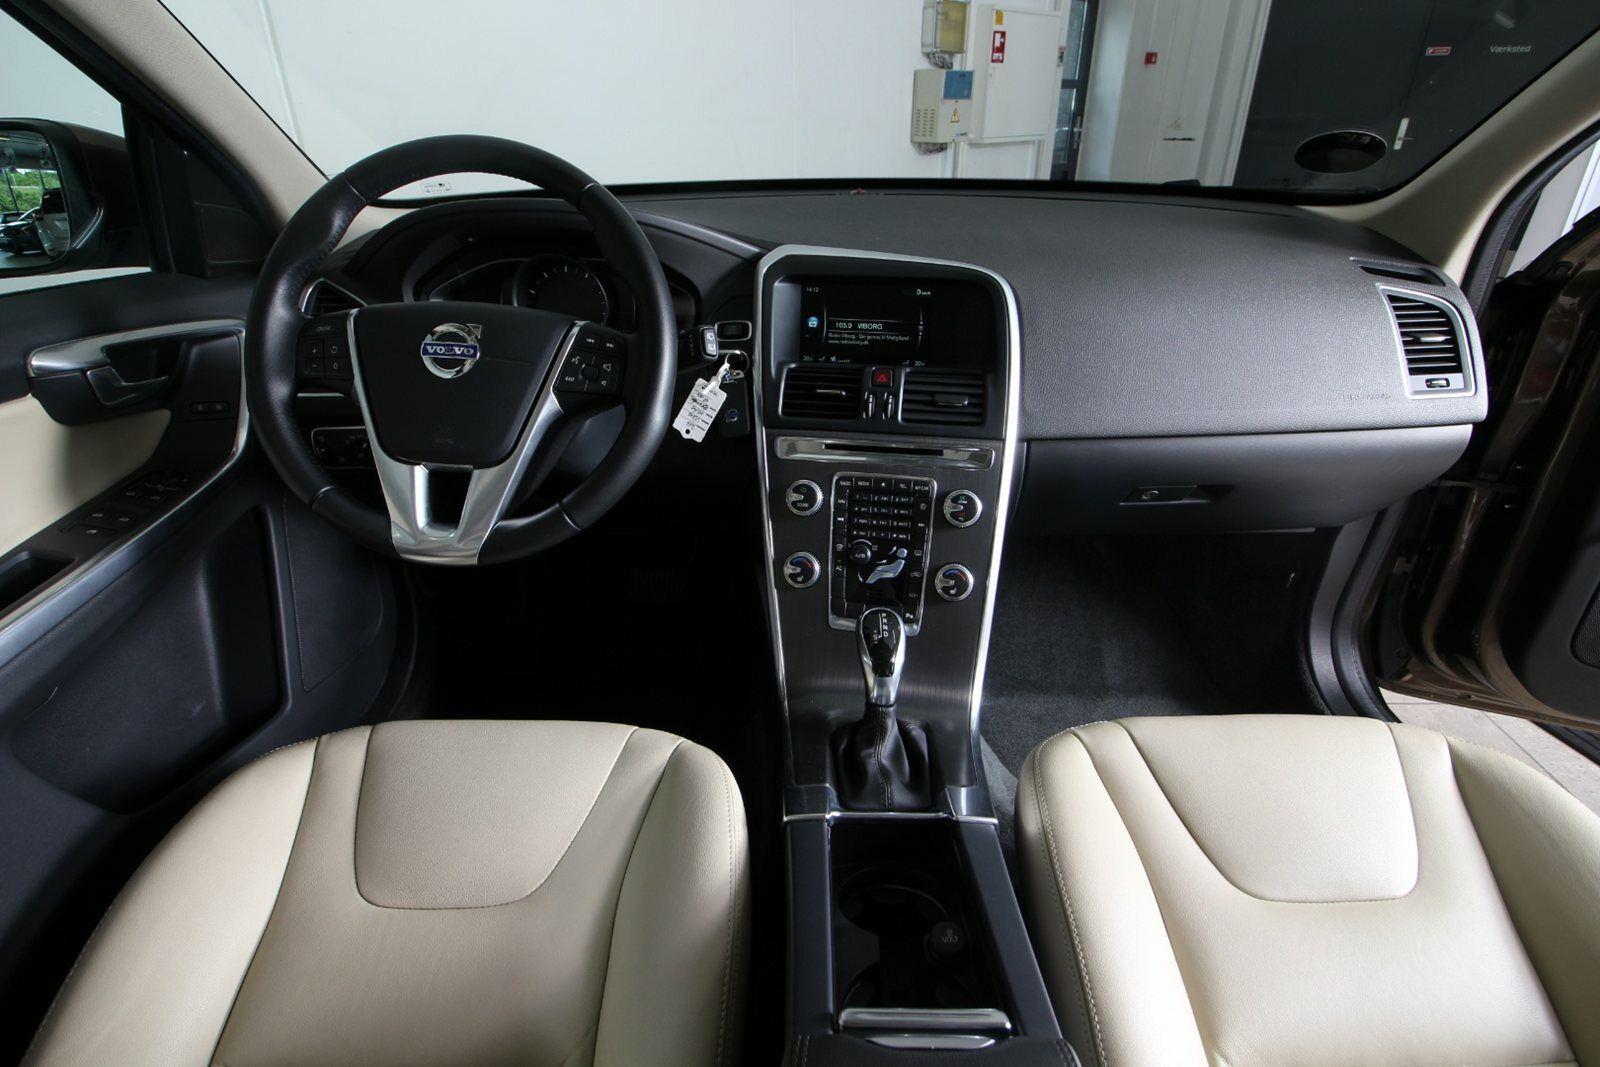 Volvo XC60 T5 245 Momentum aut.